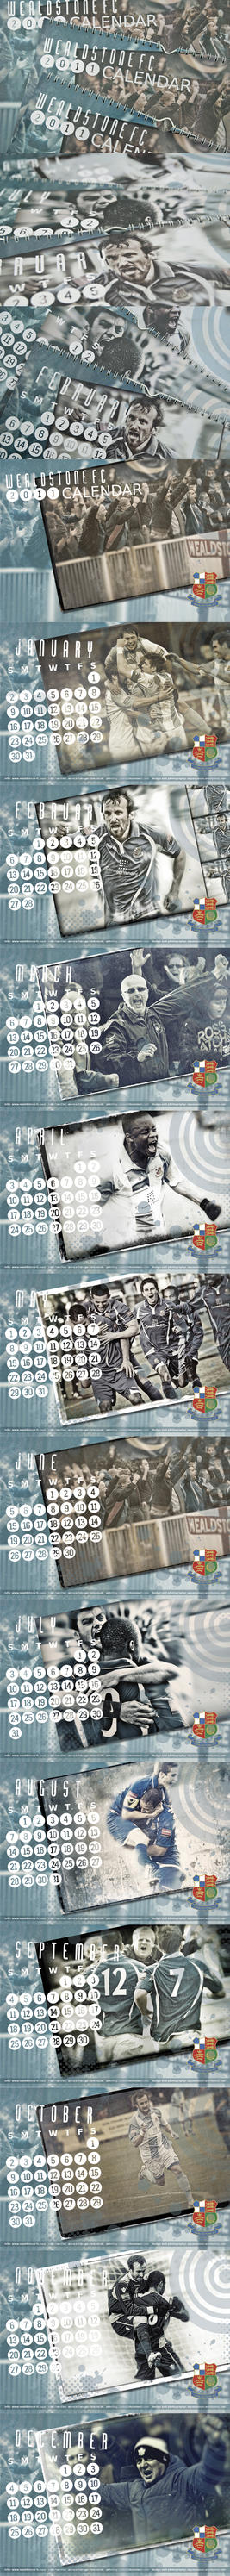 Wealdstone FC 2011 Calendar by aqueous-sun